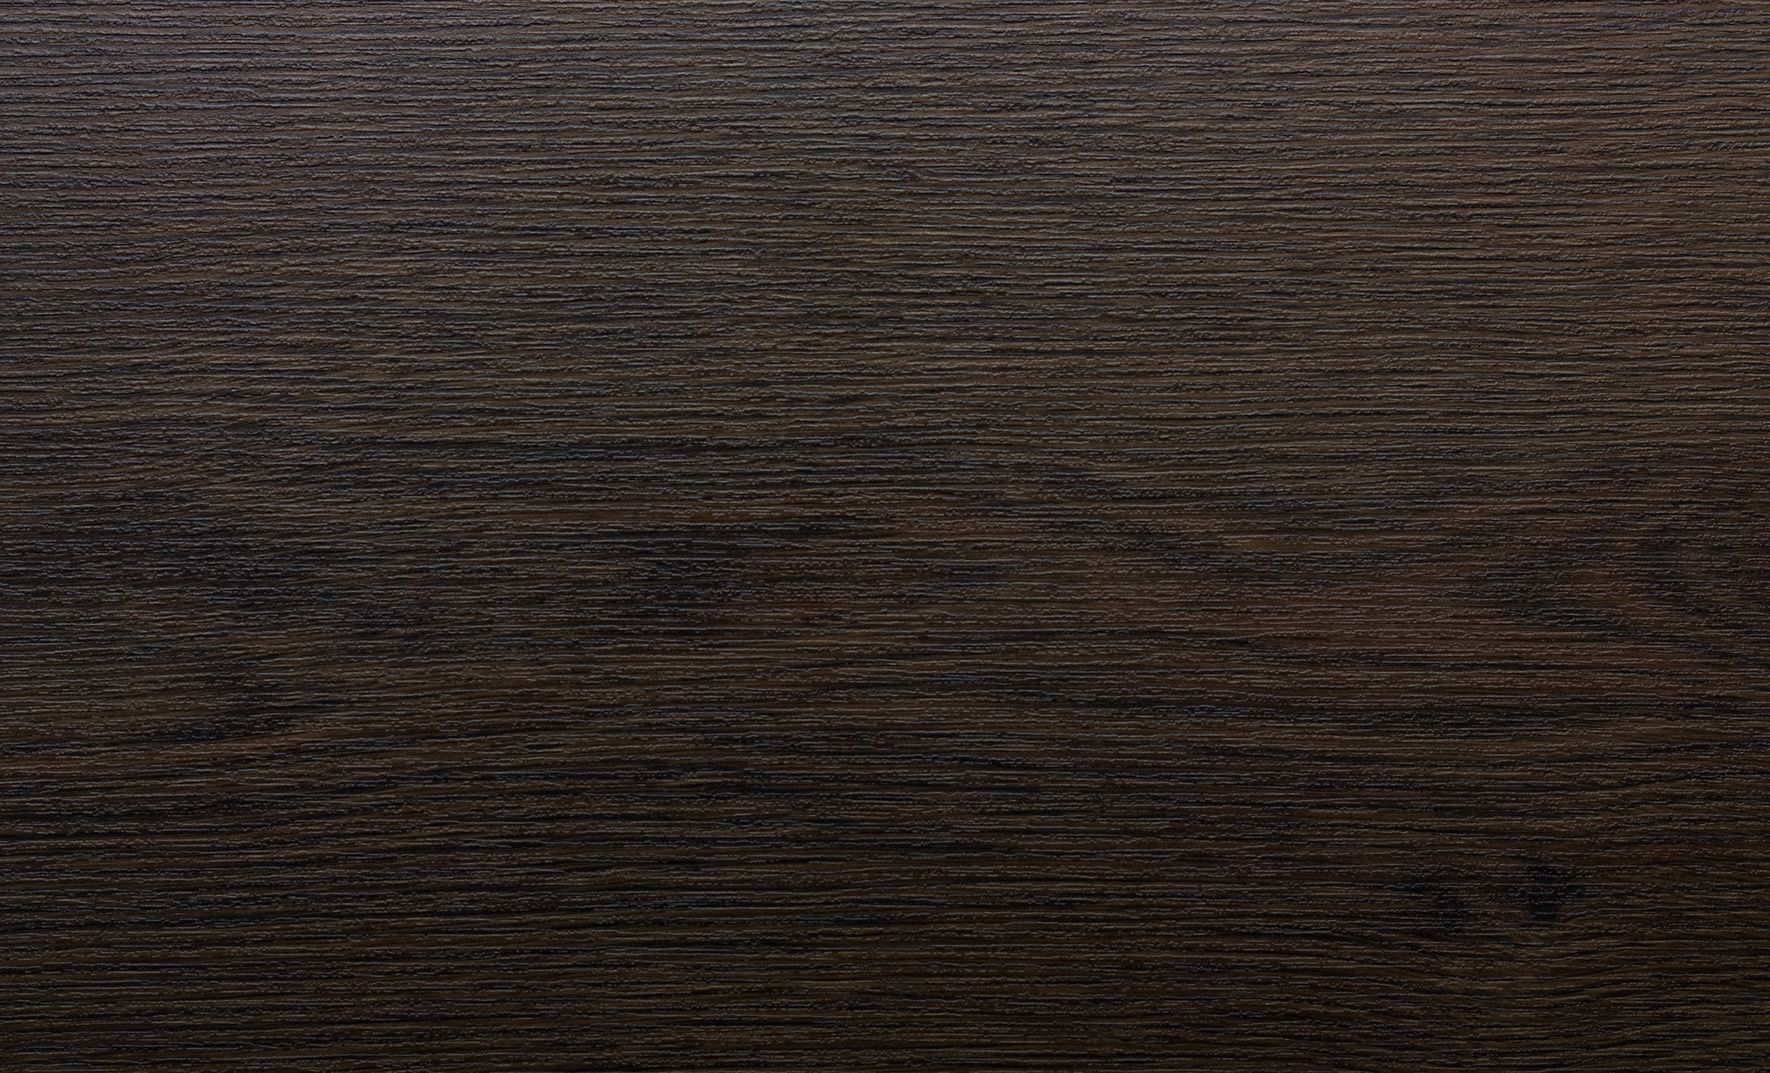 Pin By Daniel Warda On Environment Design 4 Dark Wood